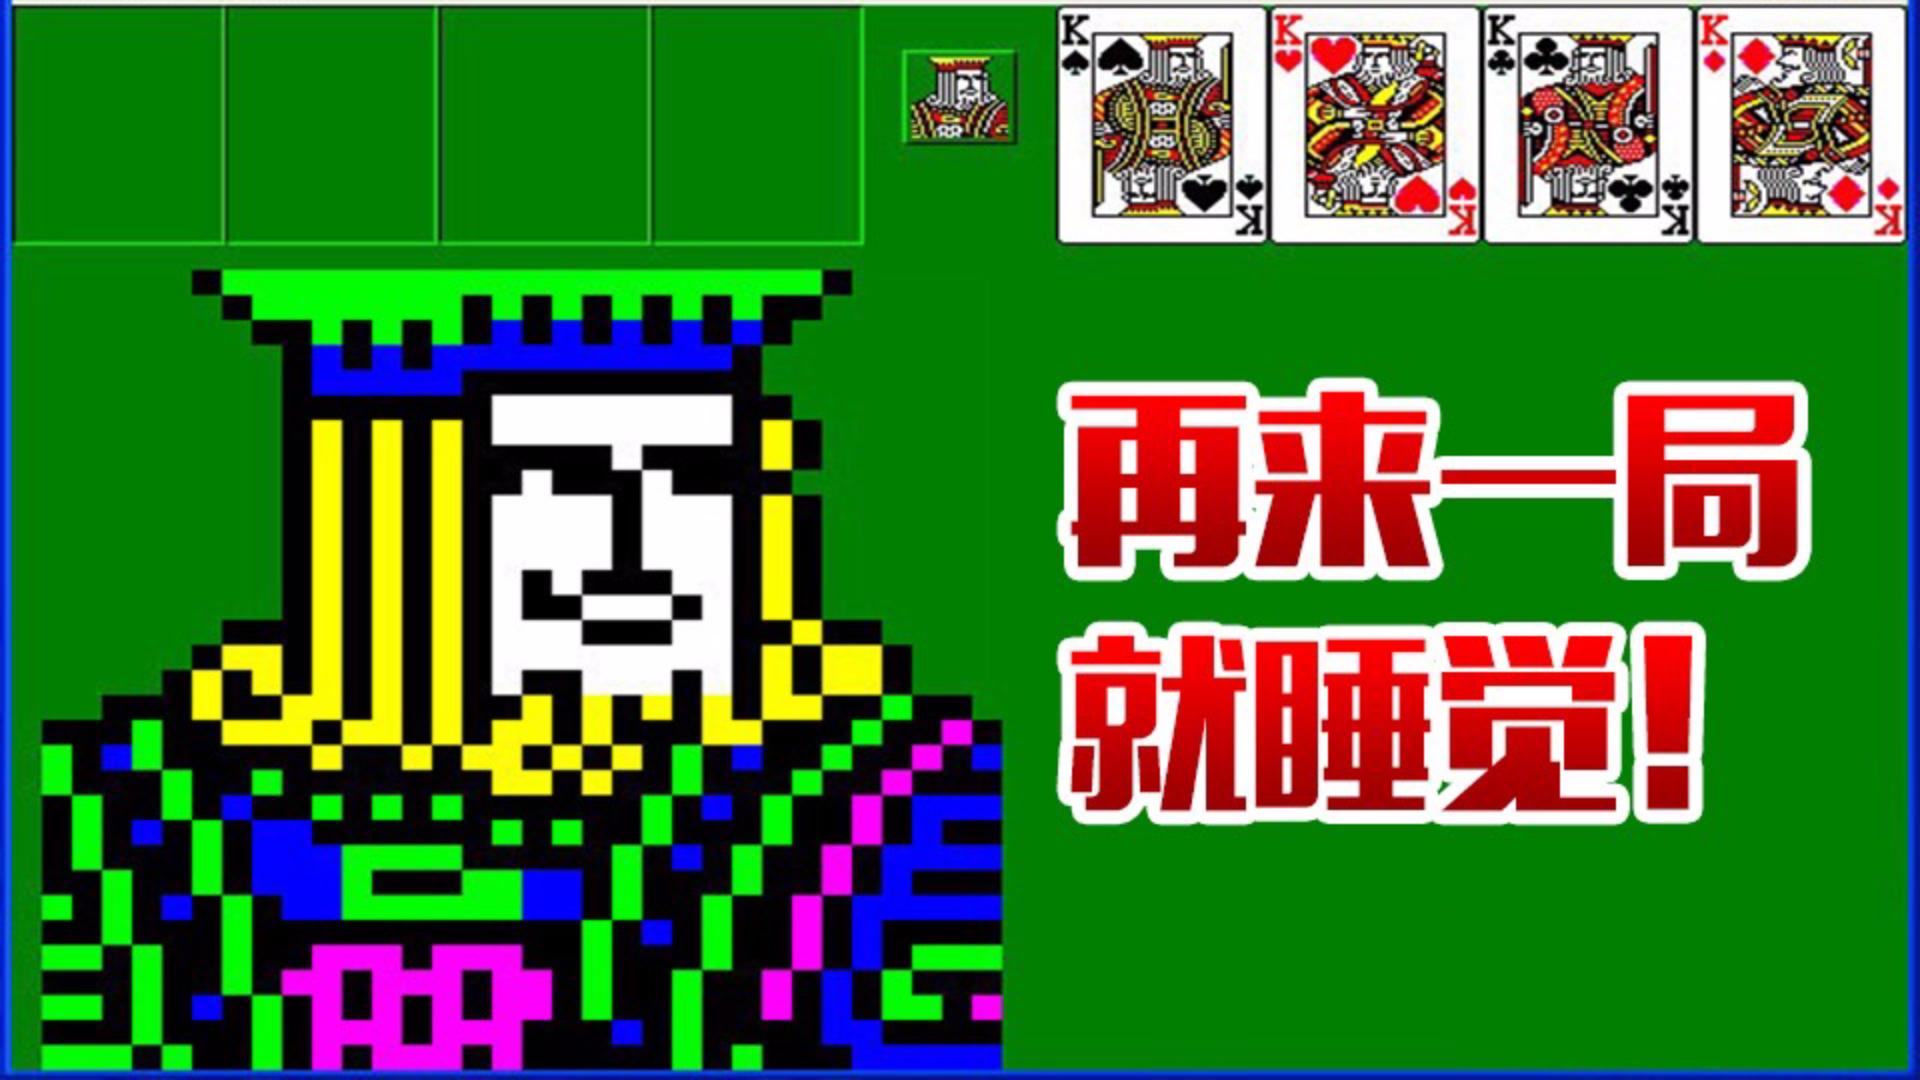 Windows系统最魔性的游戏!别说你没玩过哦